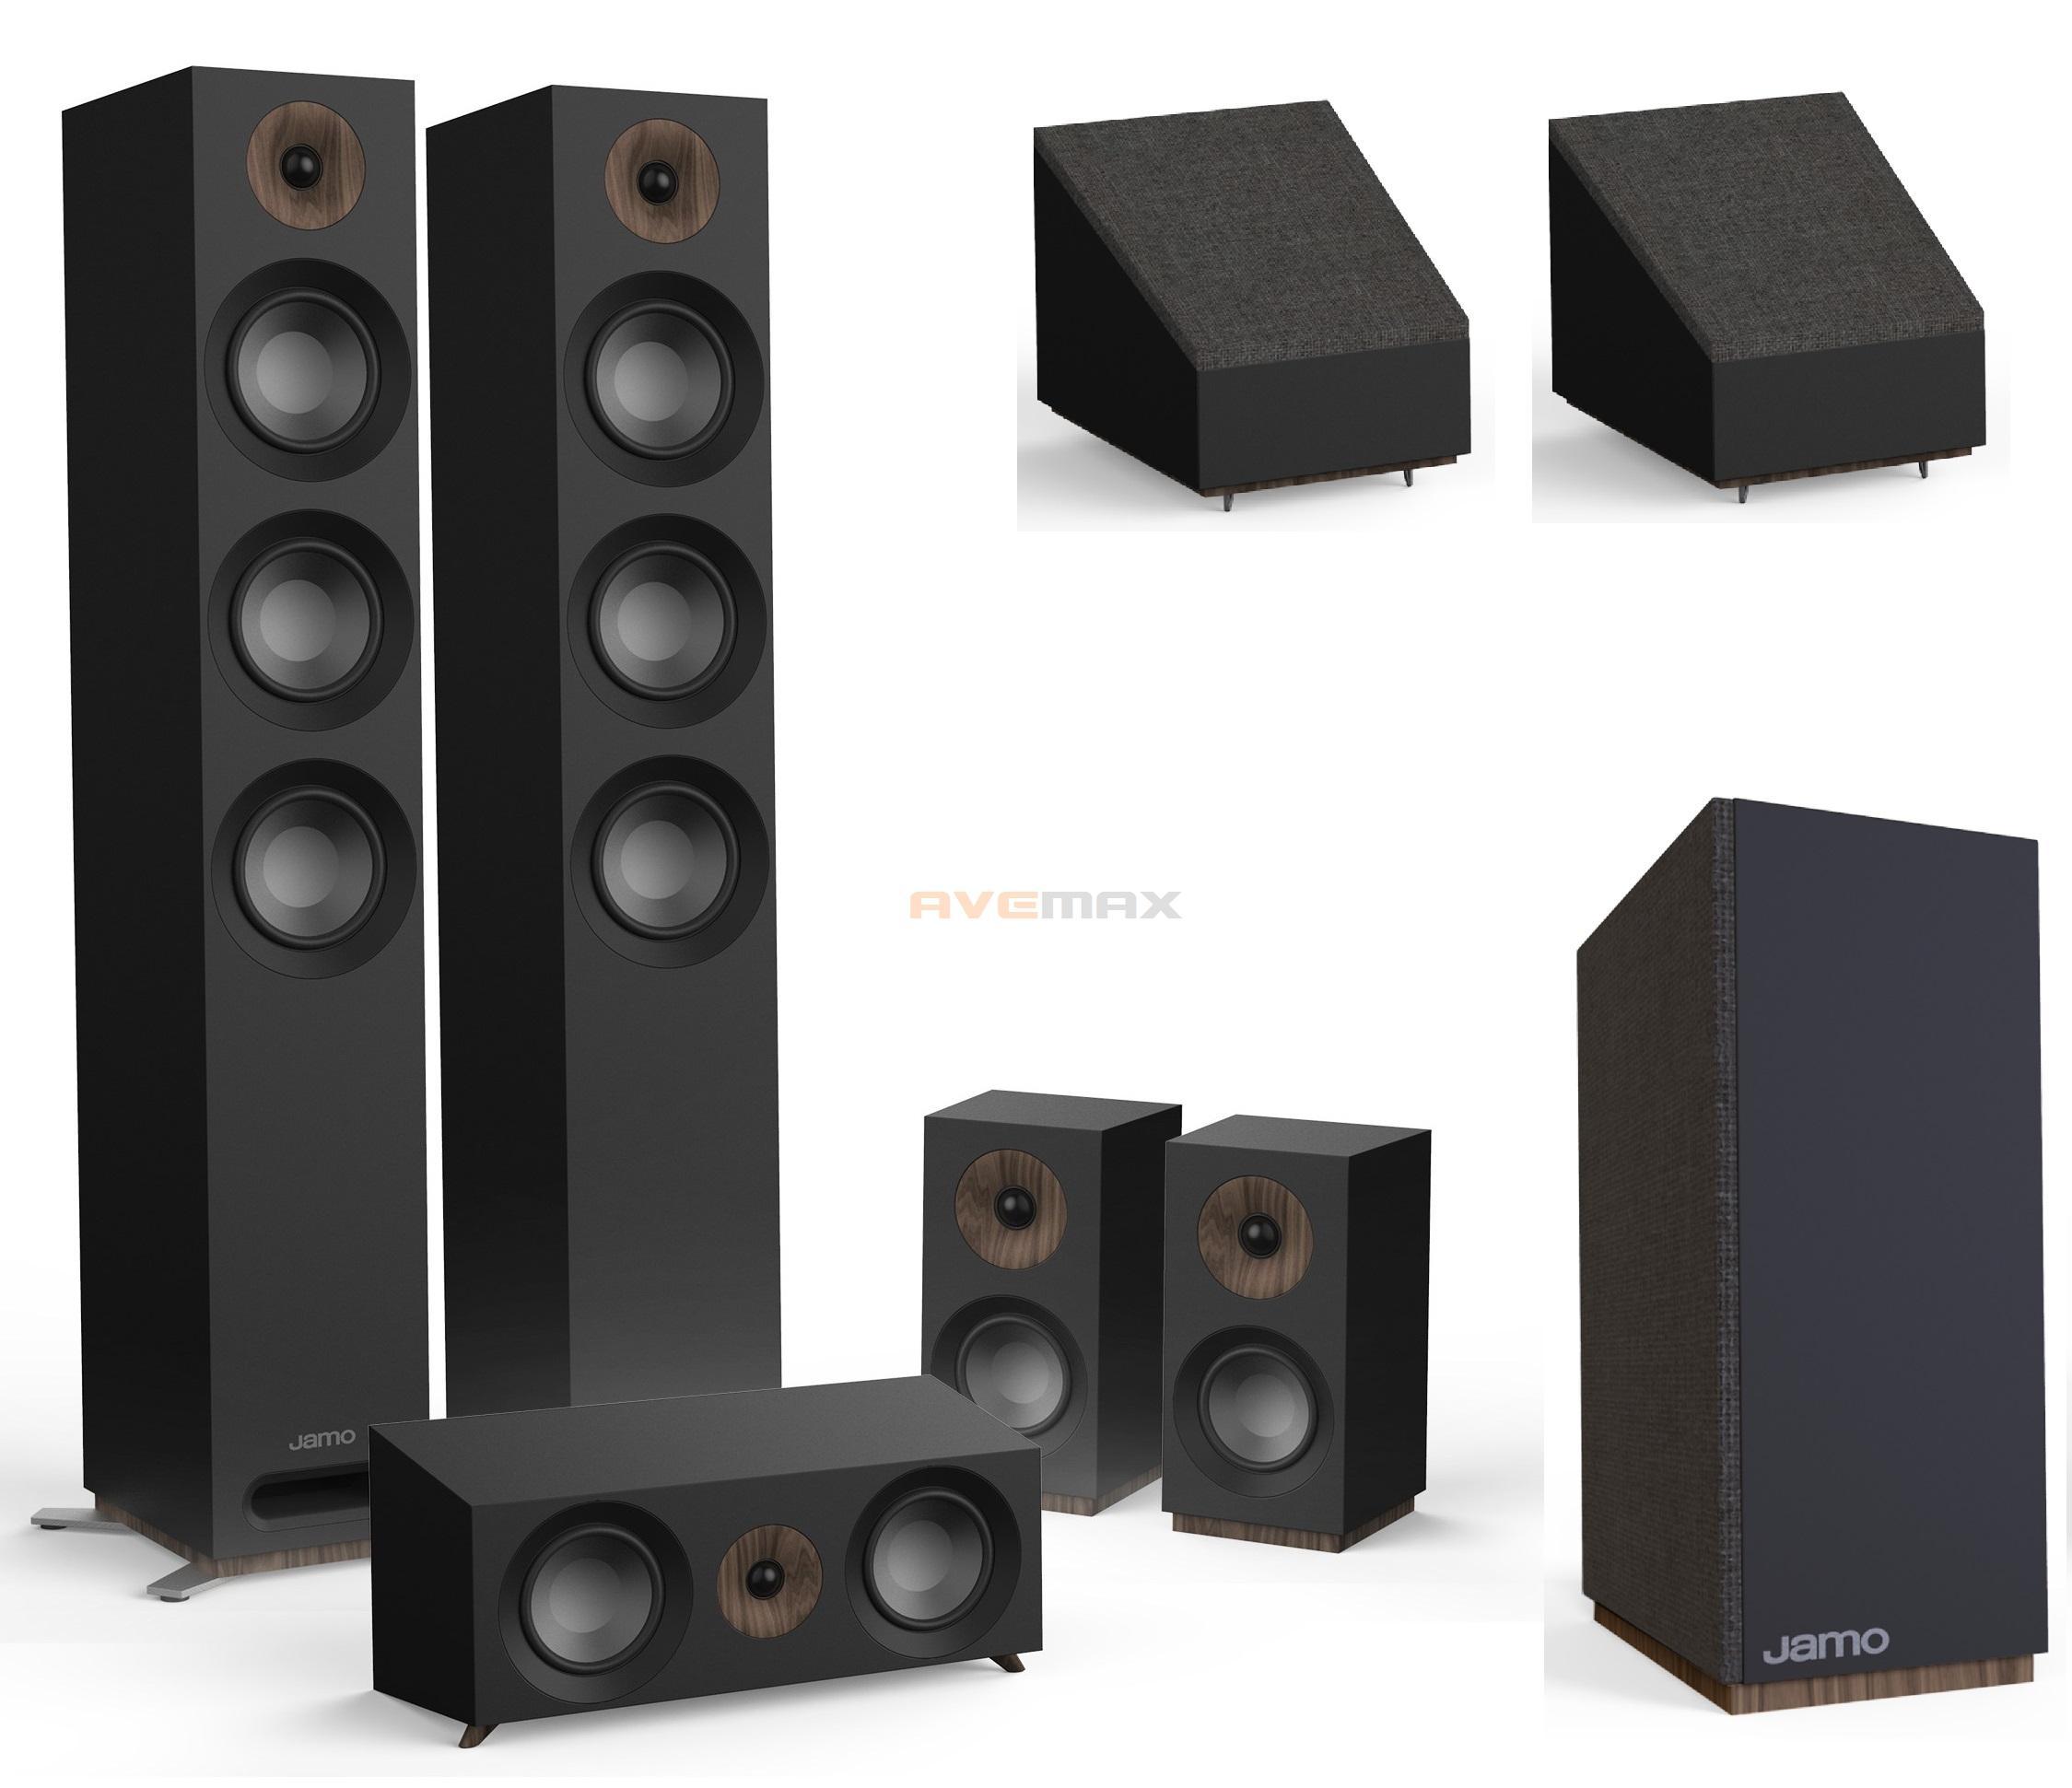 b94ef5cde Jamo S 809 HCS 10 + Dolby Atmos (černé) | YAMAHA SHOP, YAMAHA AUDIO ...